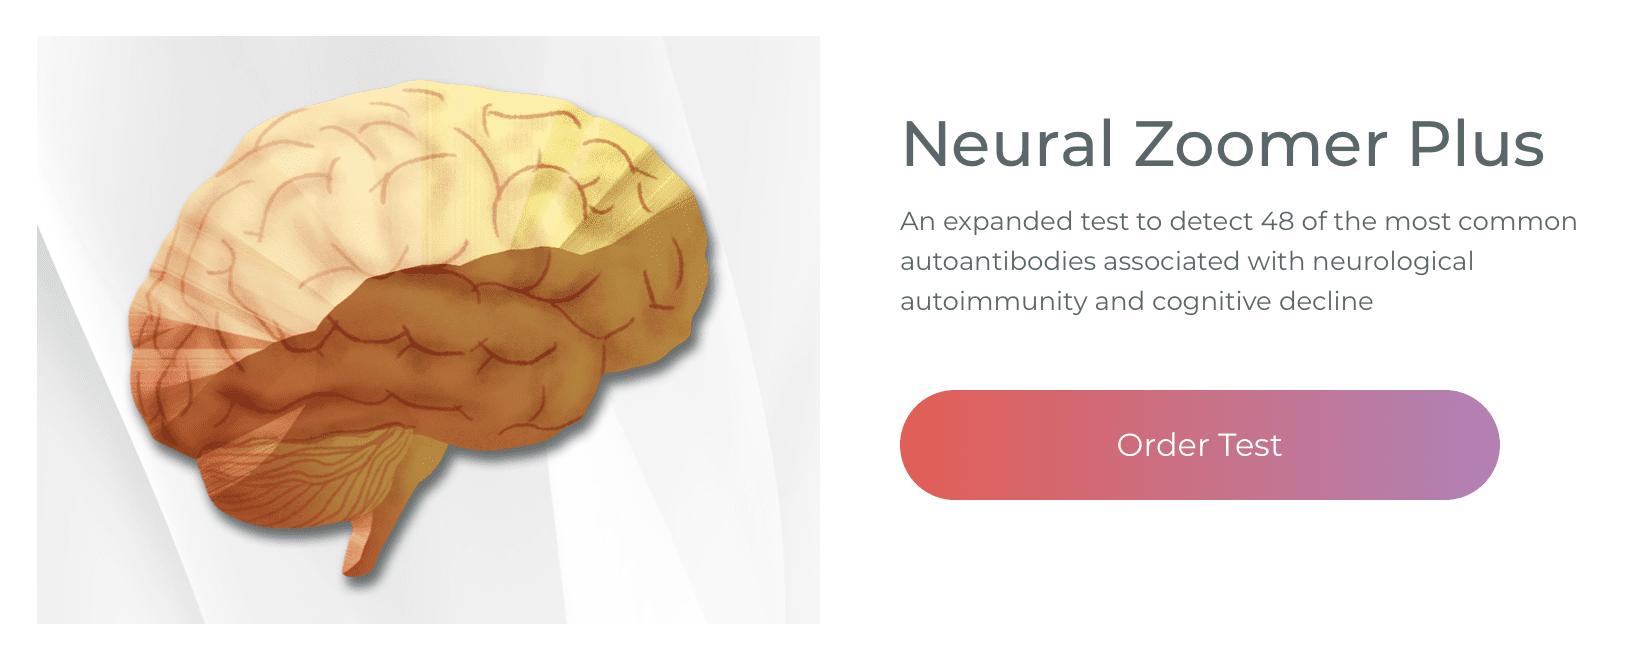 Neural Zoomer Plus | Chiropratico El Paso, TX